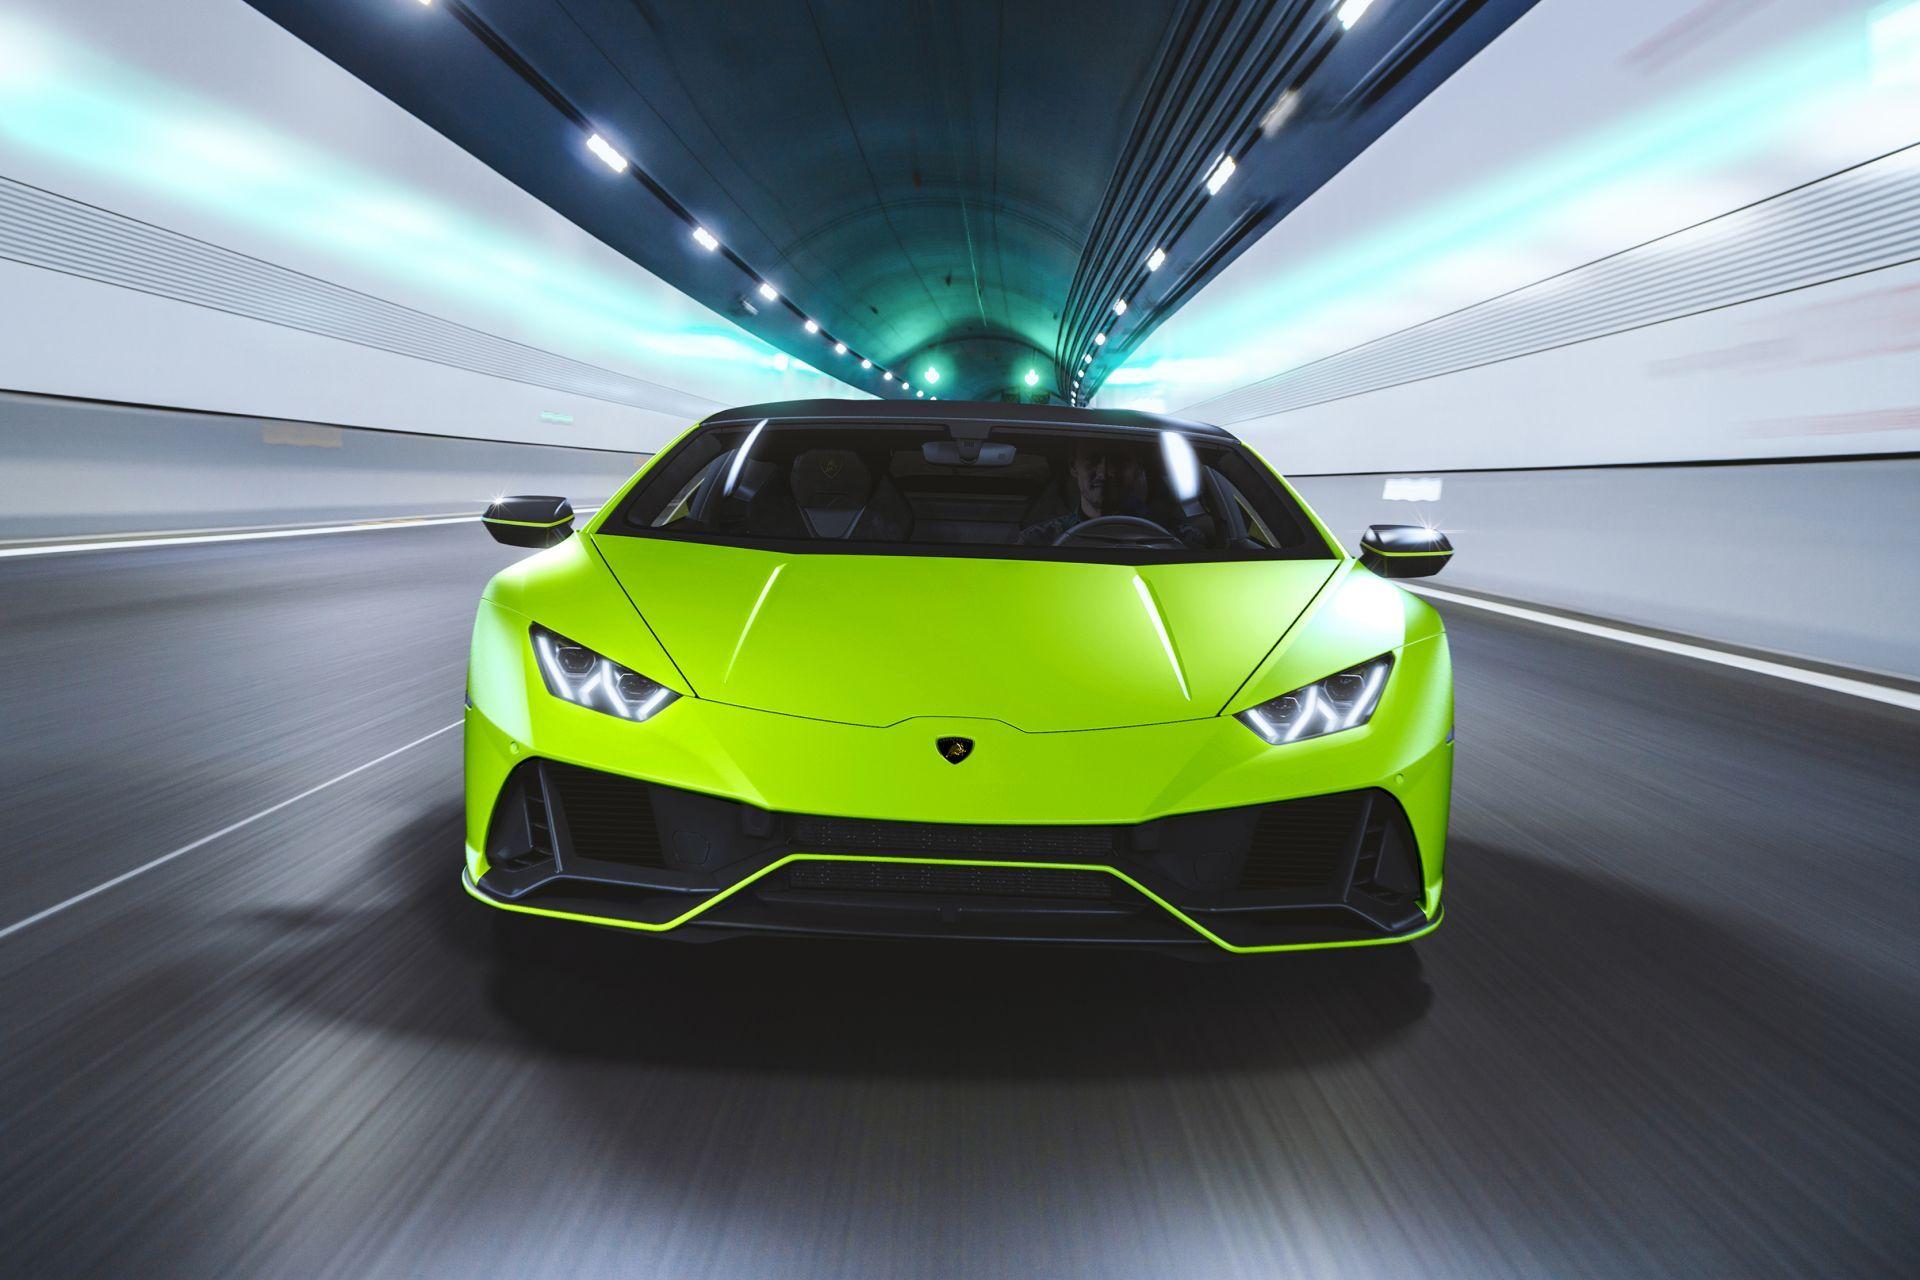 Lamborghini-Huracan-Evo-Fluo-Capsule-14